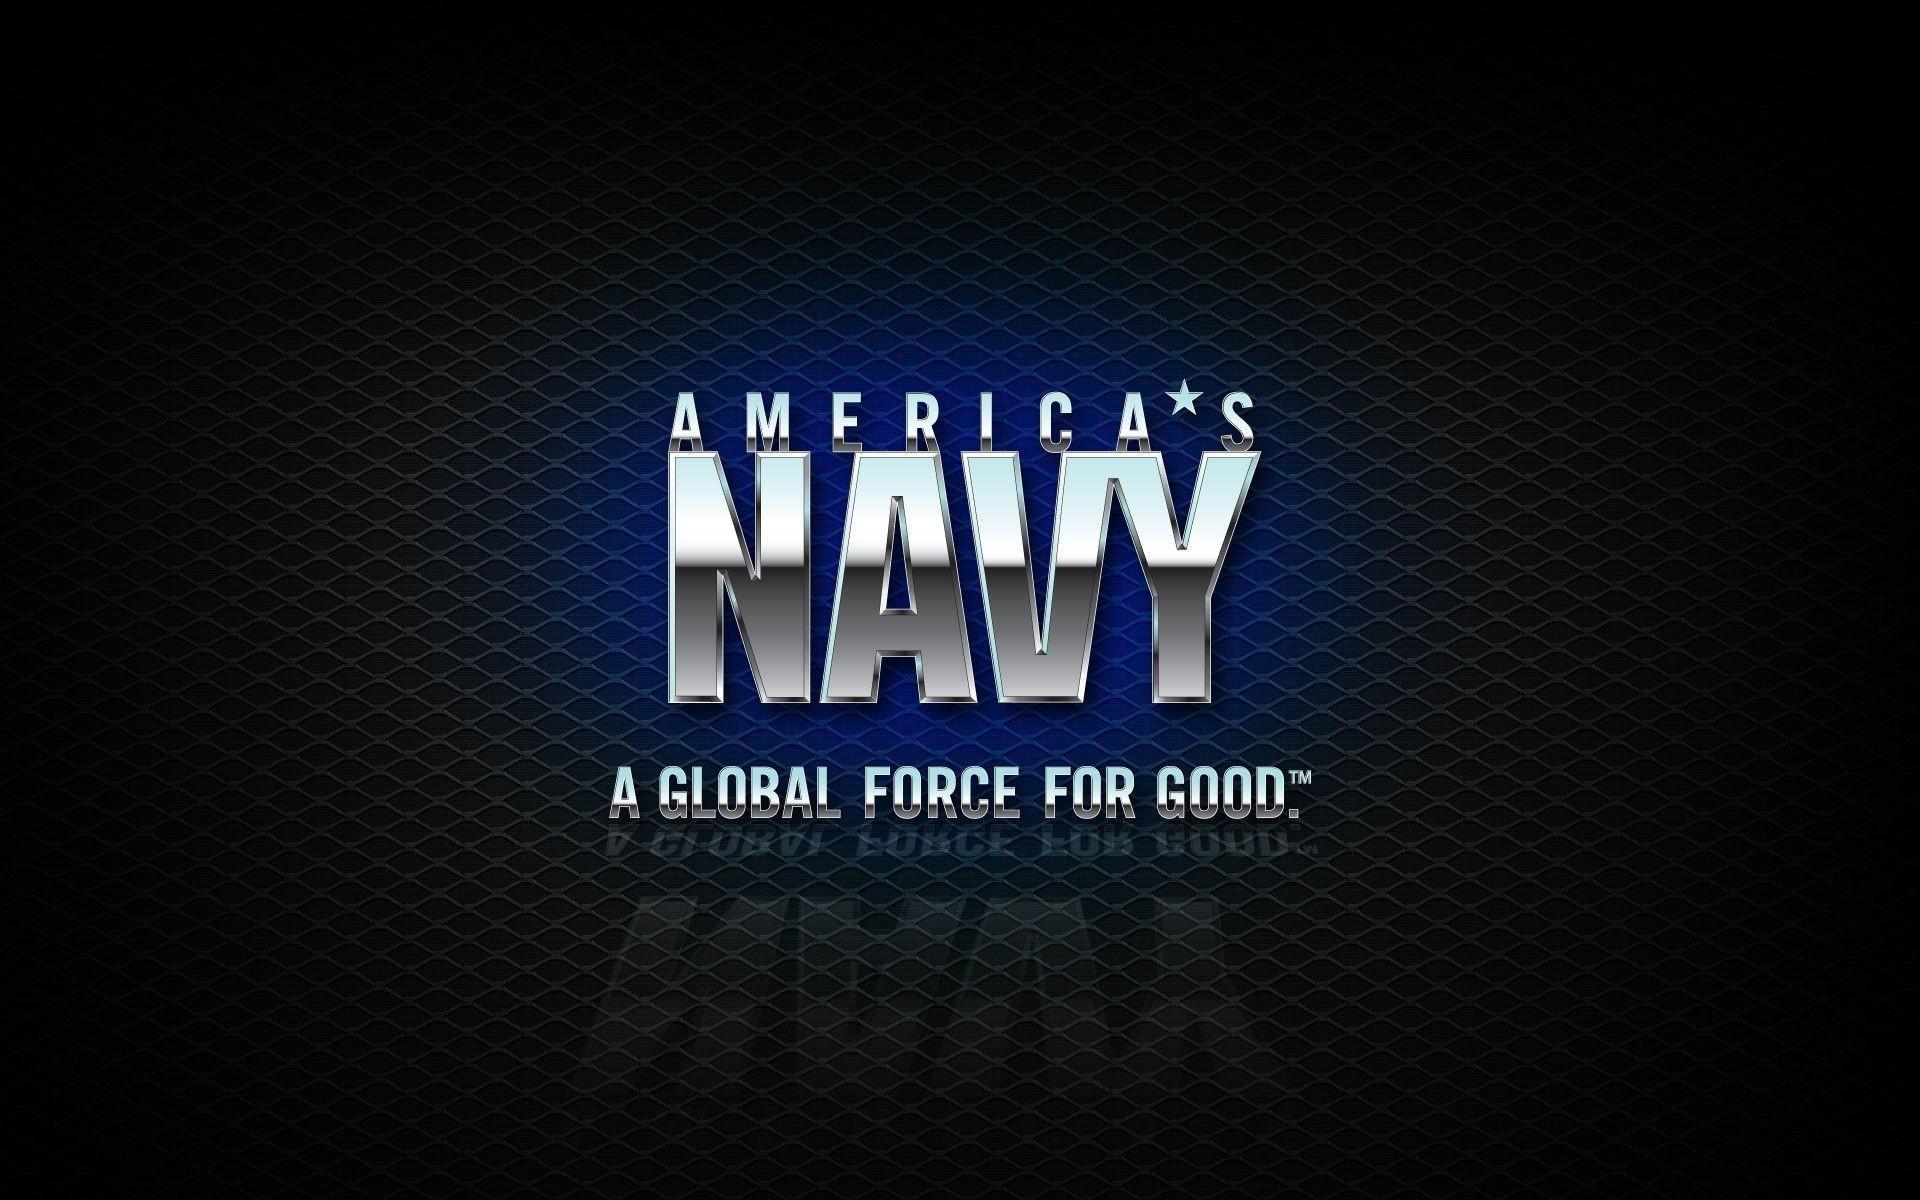 Us navy seal logo wallpaper 56 images 1920x1200 united states navy seals hd wallpaper wallpapers pinterest hd wallpaper altavistaventures Image collections